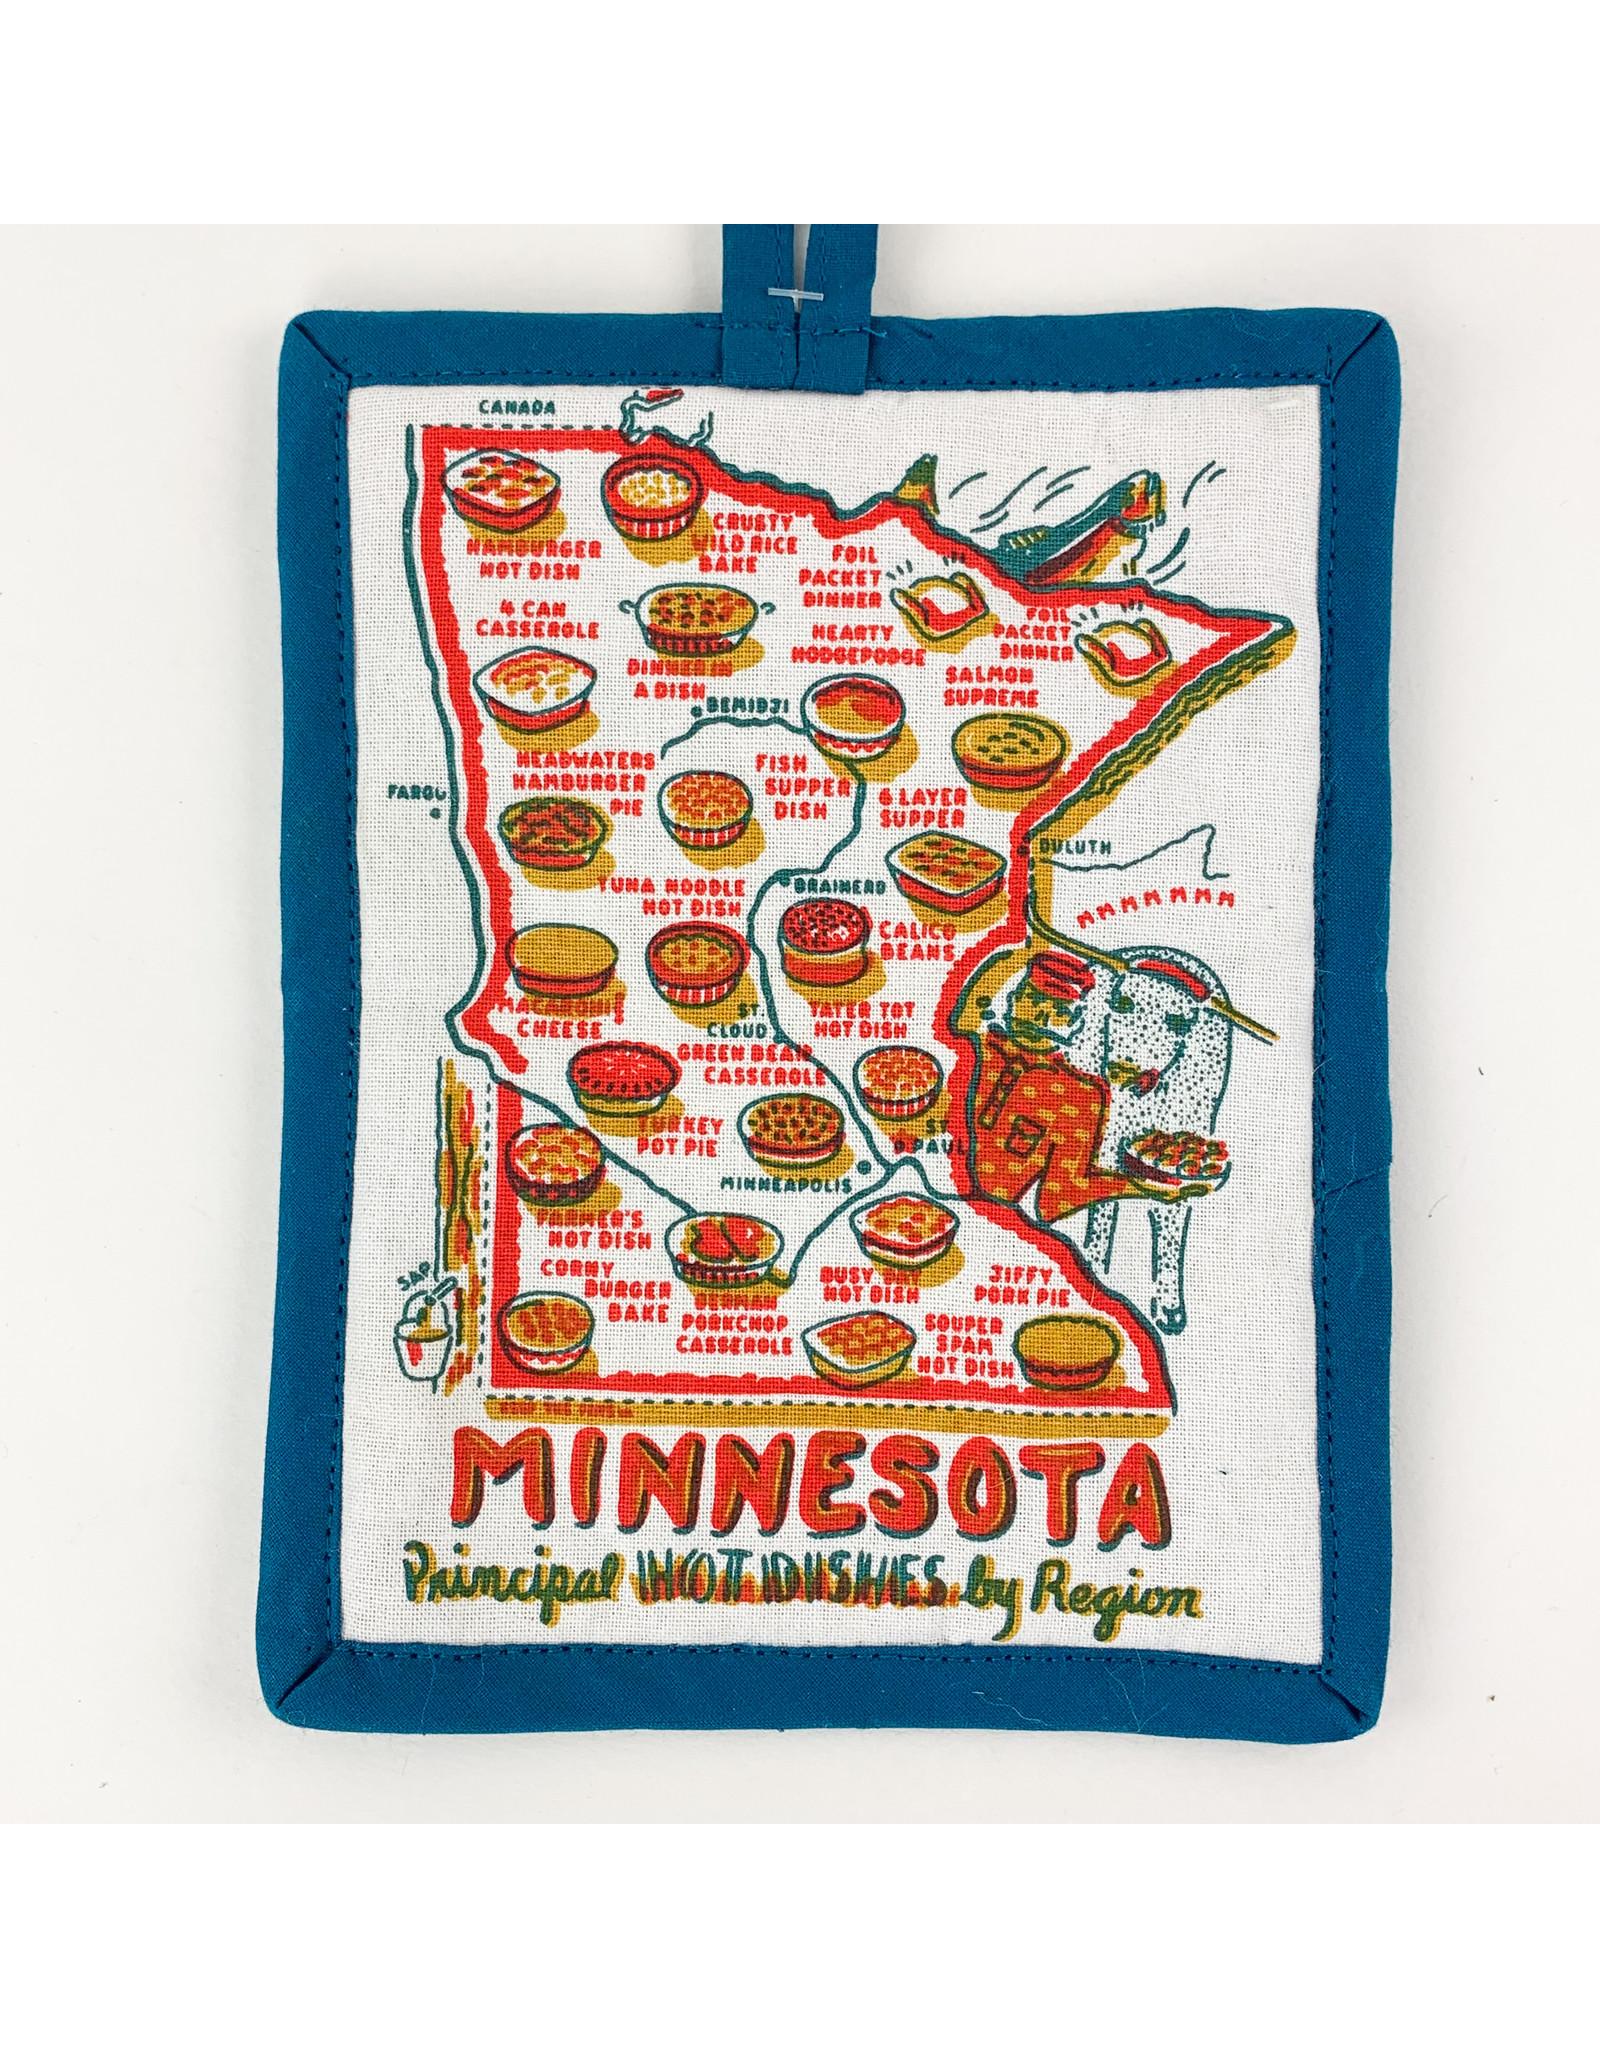 One Hundred 80 Degrees Hot Pad-Minnesota: Principal Hotdish by Region